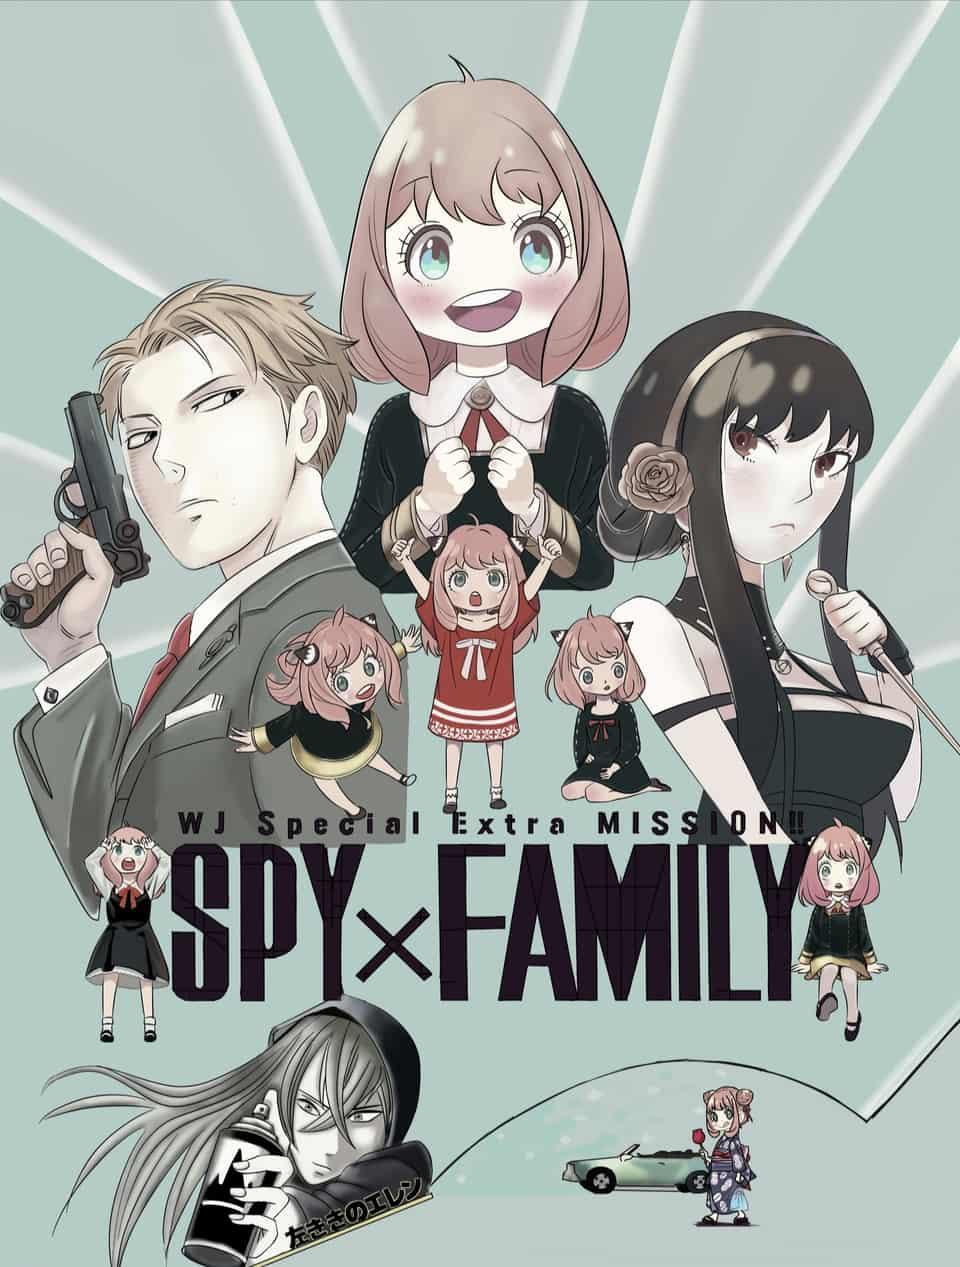 SPY×FAMILY Illust of 蜜桃妹妹 SPY×FAMILY_Contest SPY×FAMILY